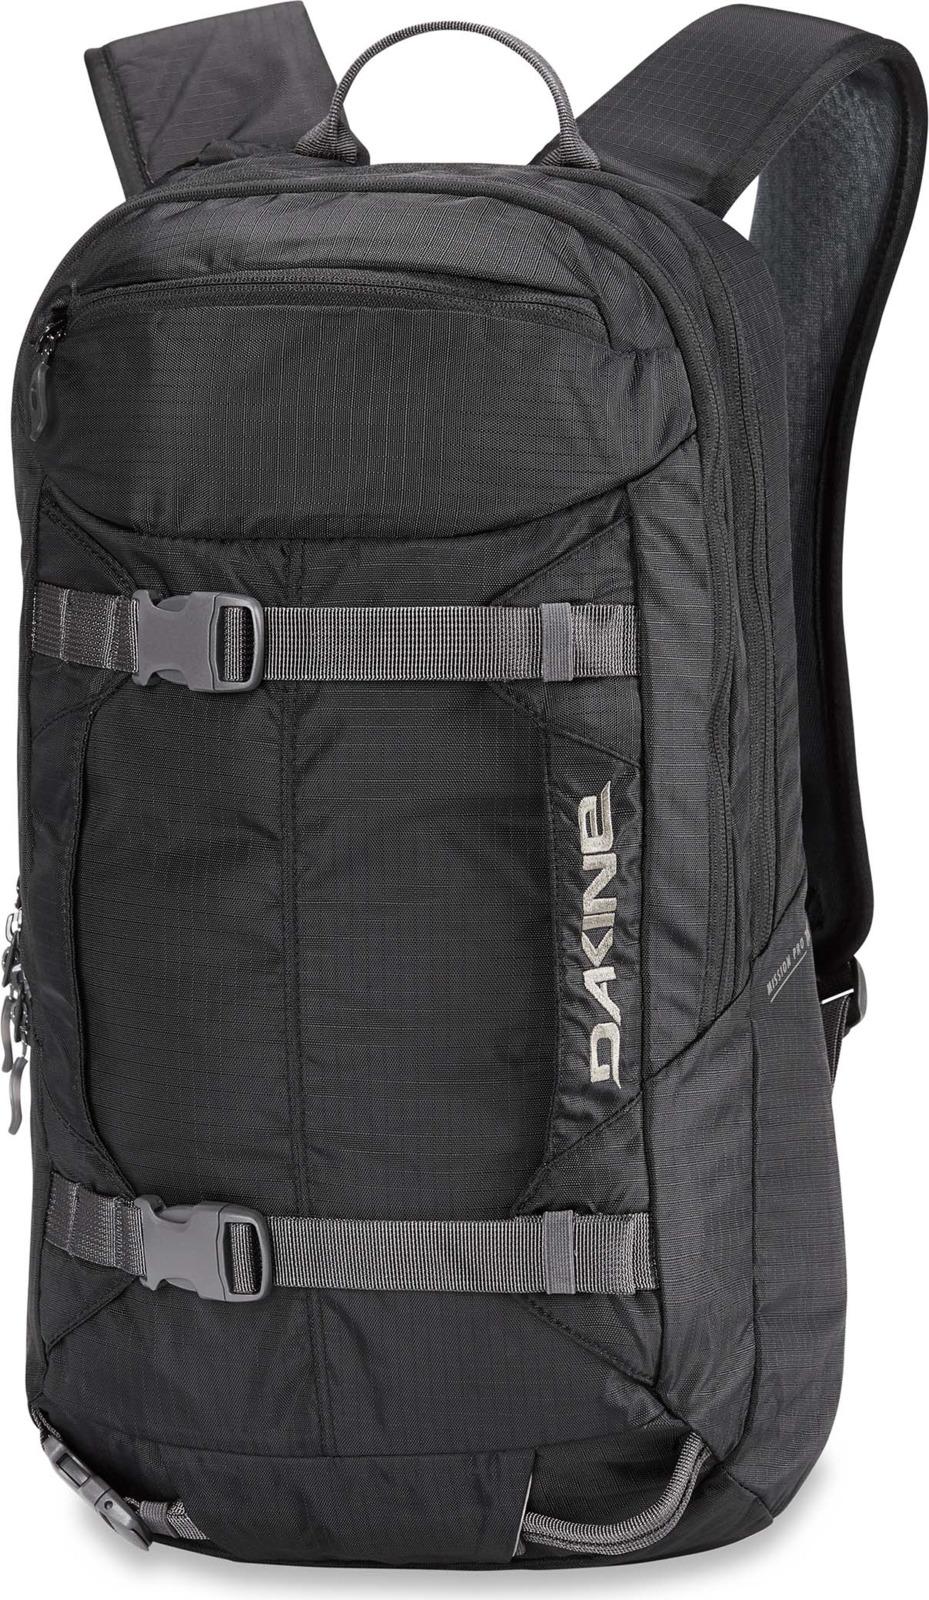 Рюкзак Dakine Mission Pro, цвет: черный, 18 л